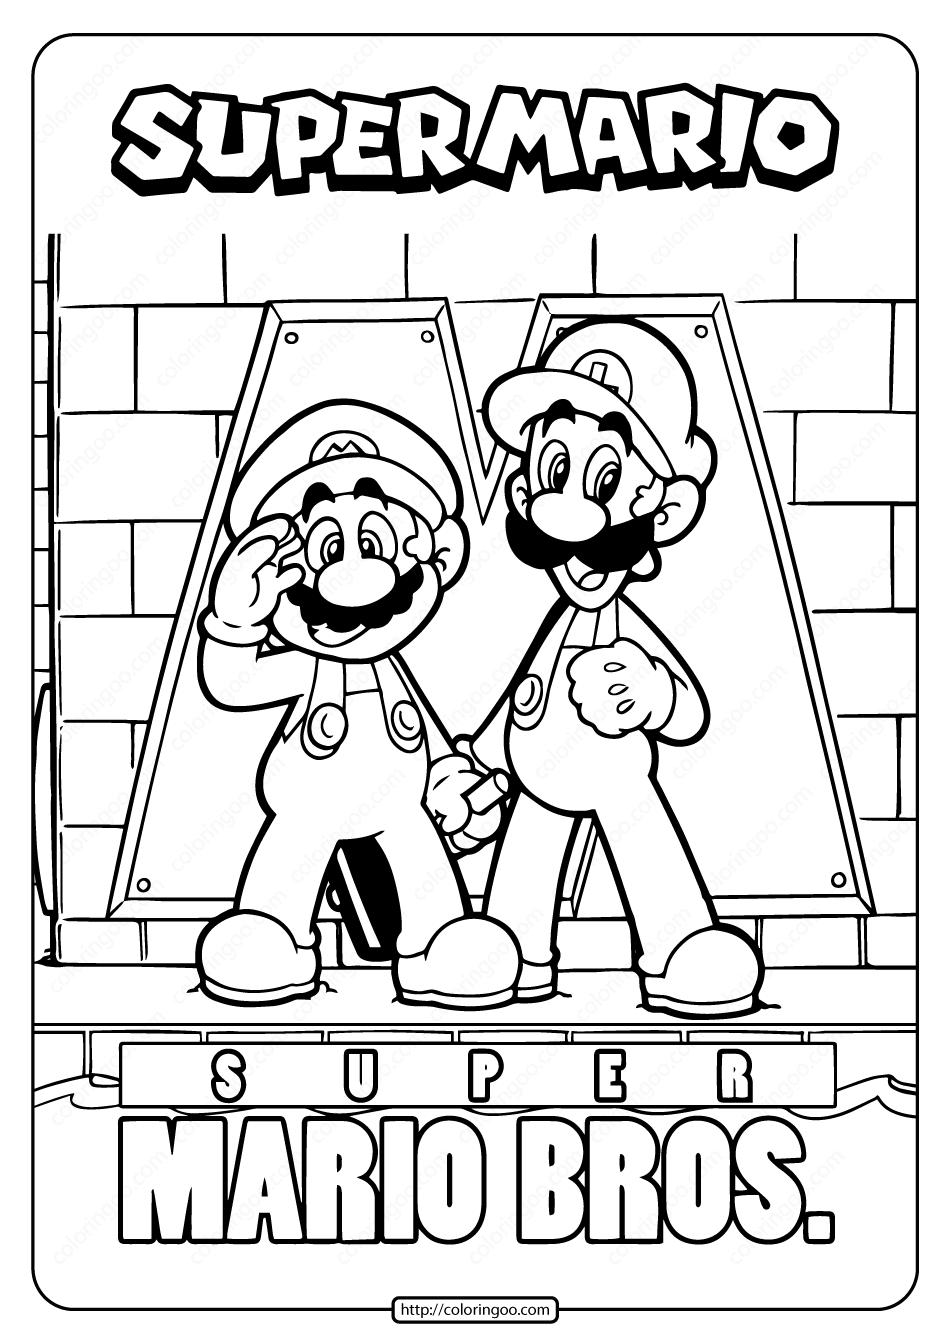 Free Printable Super Mario Bros Coloring Page Mario Coloring Pages Super Mario Coloring Pages Coloring Pages [ 1344 x 950 Pixel ]